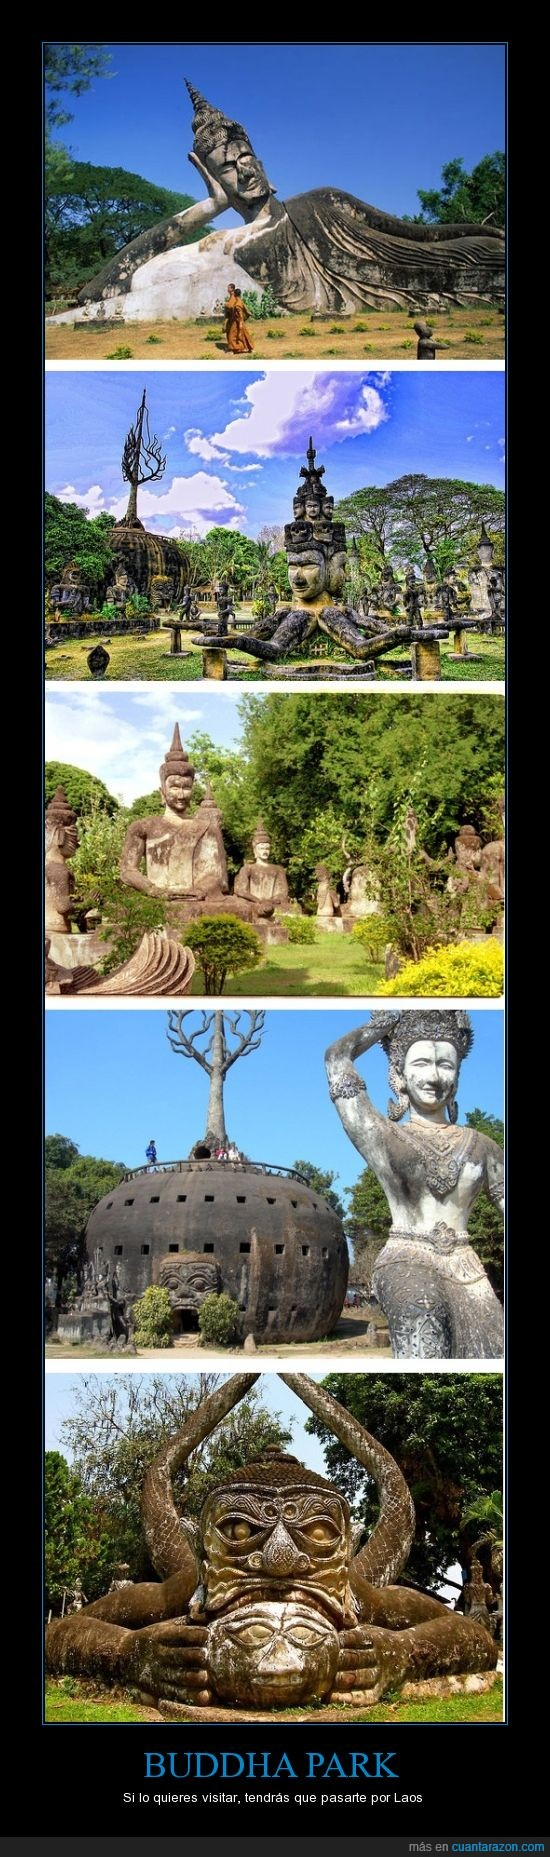 buddha park,esculturas,laos,parque